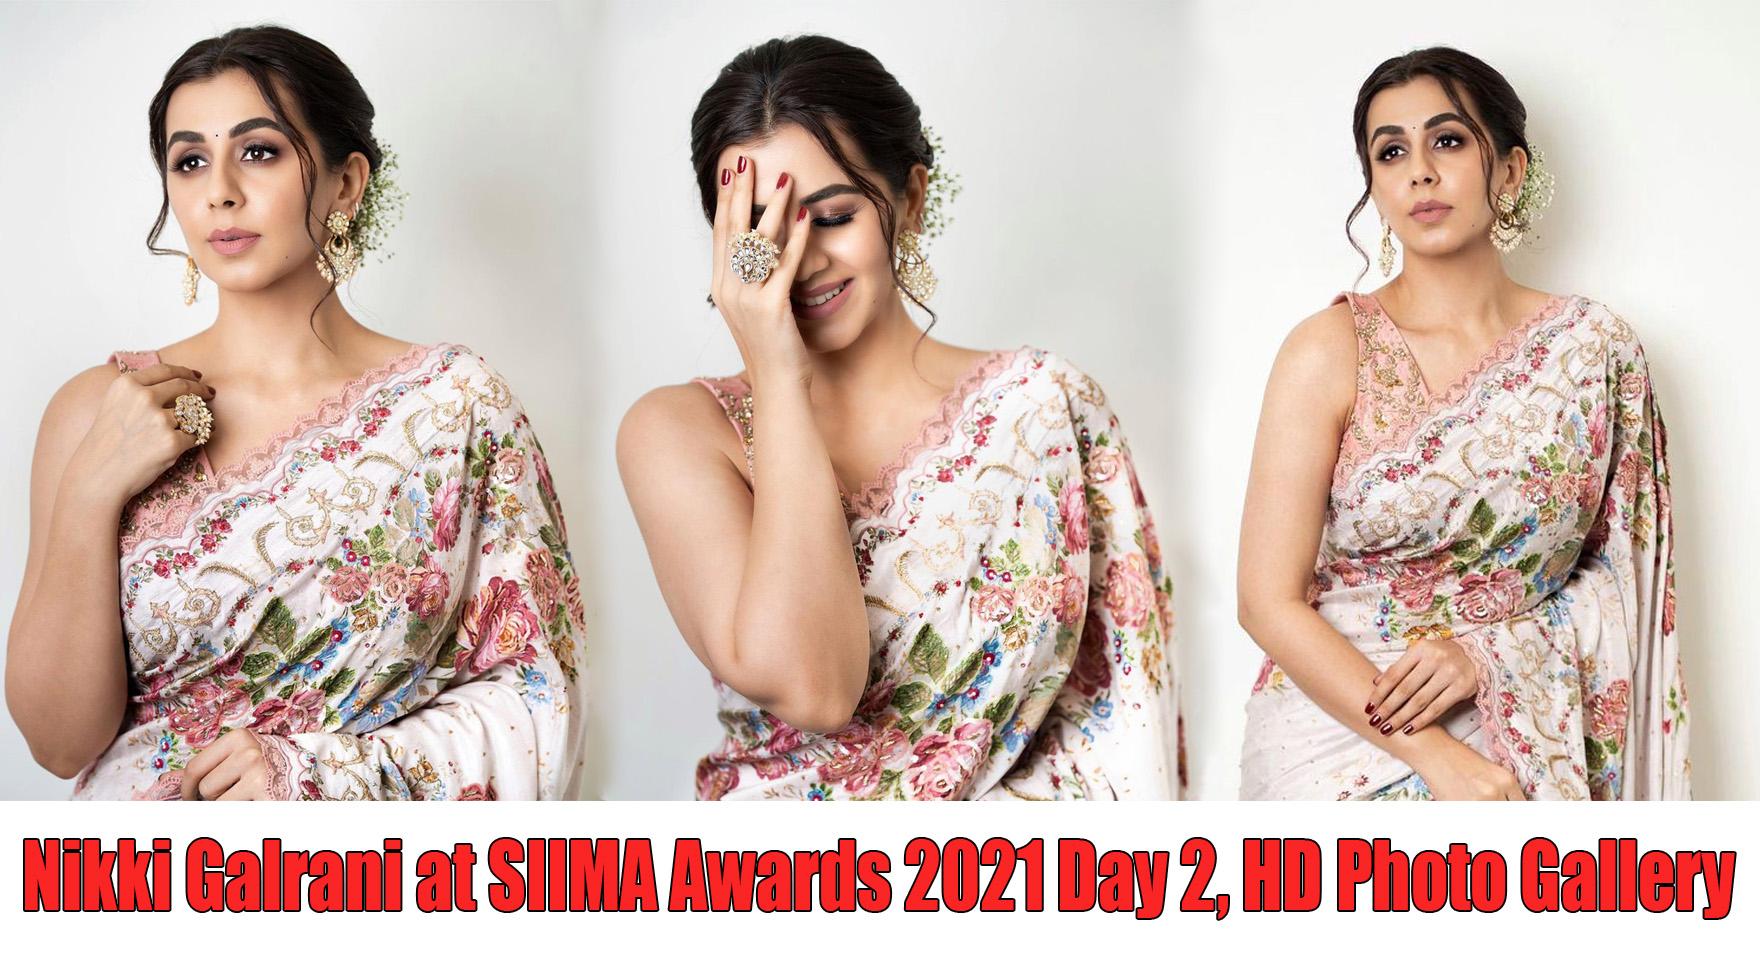 Nikki Galrani at SIIMA Awards 2021 Day 2, HD Photo Gallery